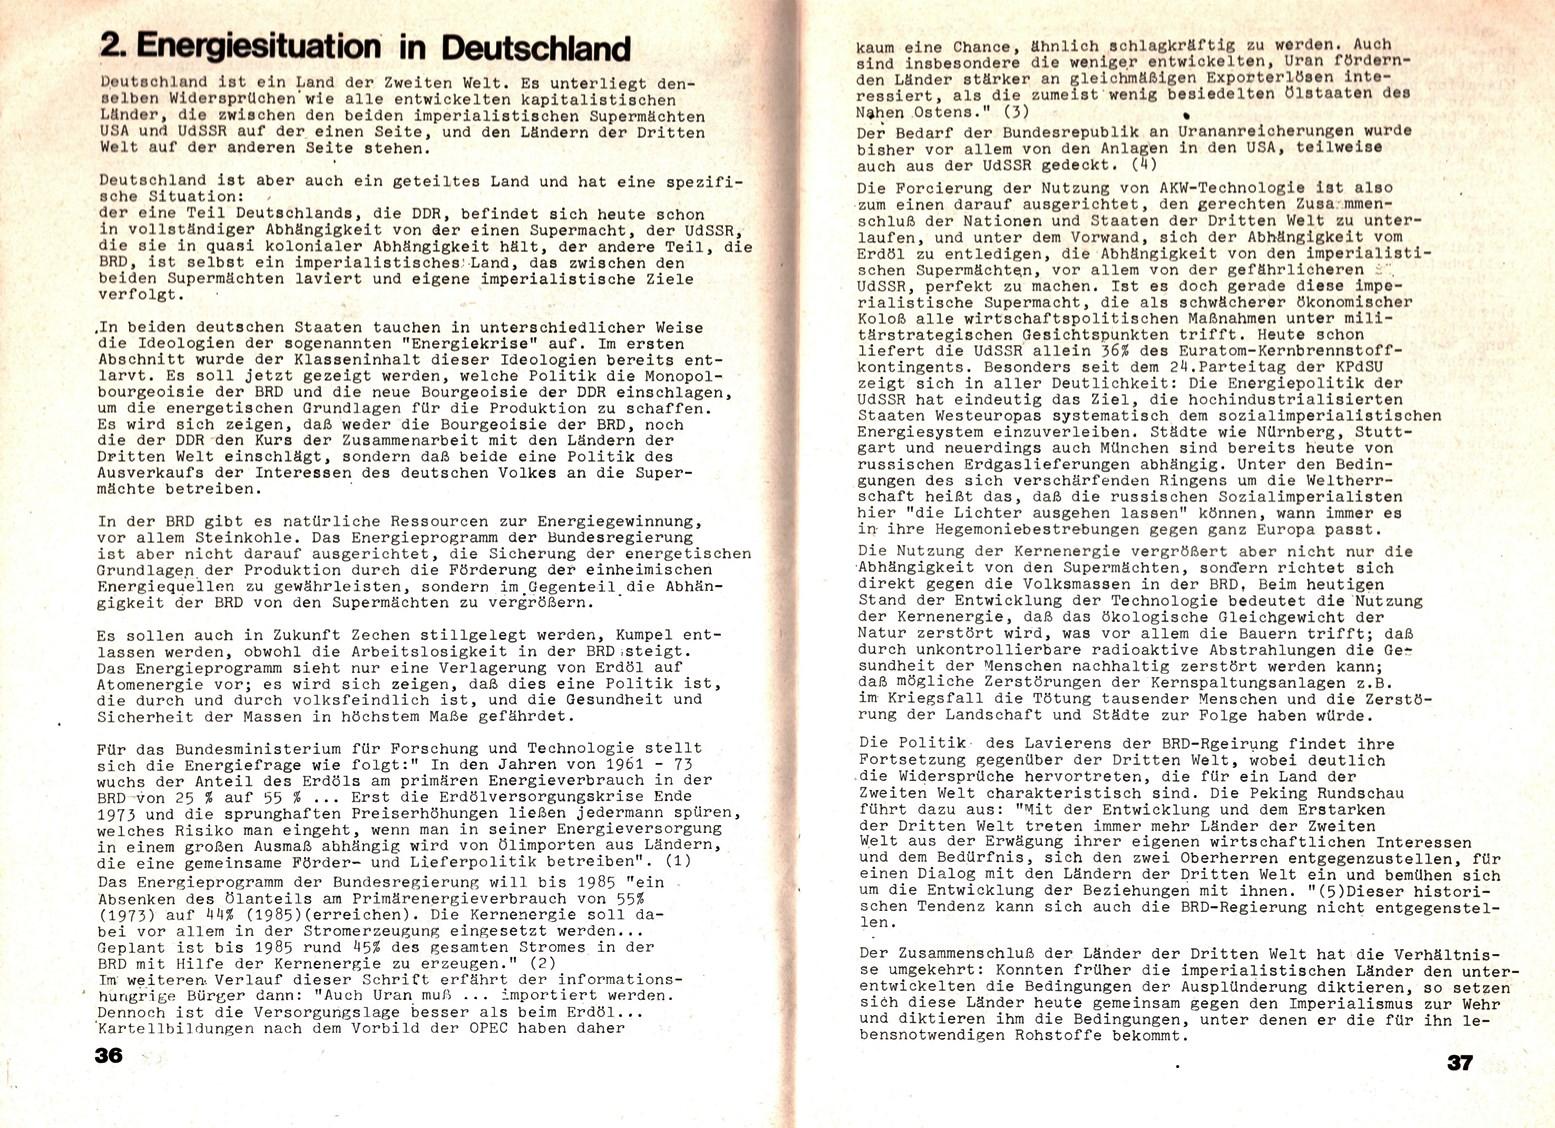 KSV_1976_Atomenergie_im_Kapitalismus_020